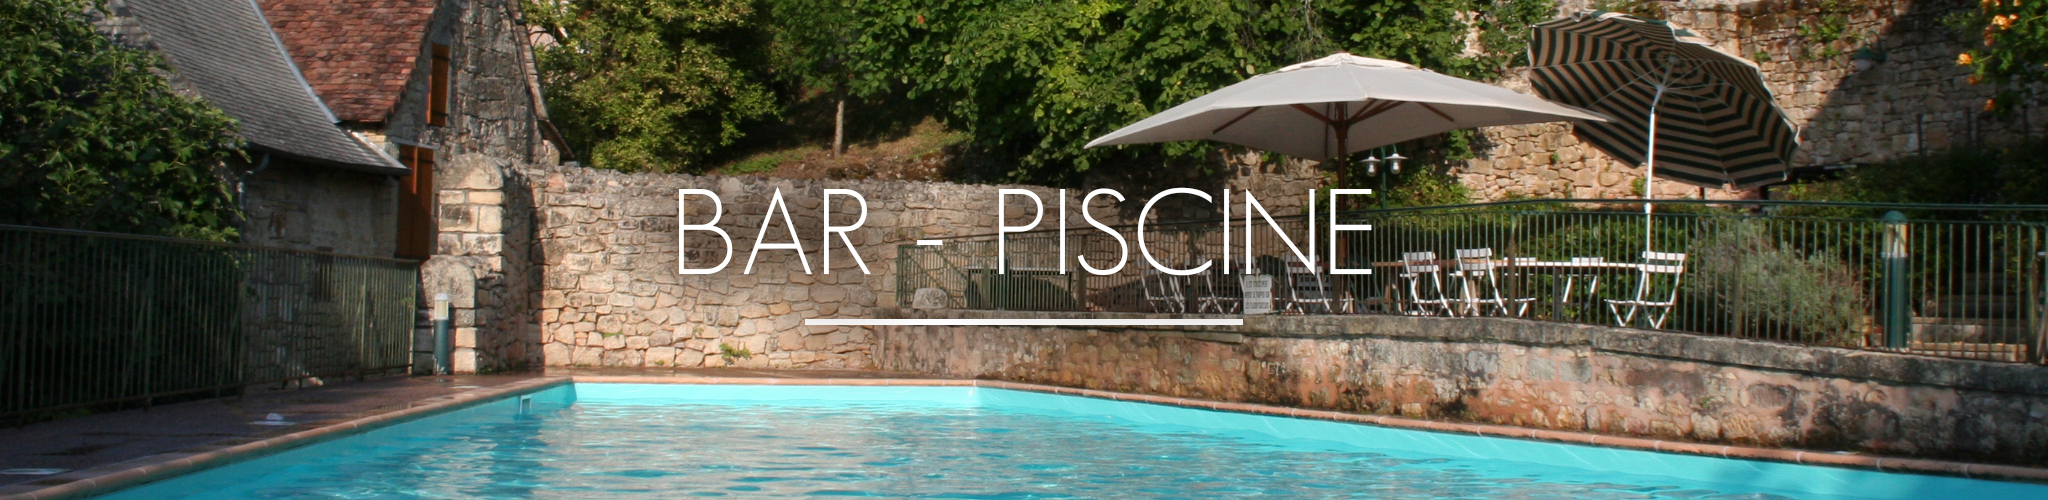 La boissi re piscine for Bar gonflable pour piscine